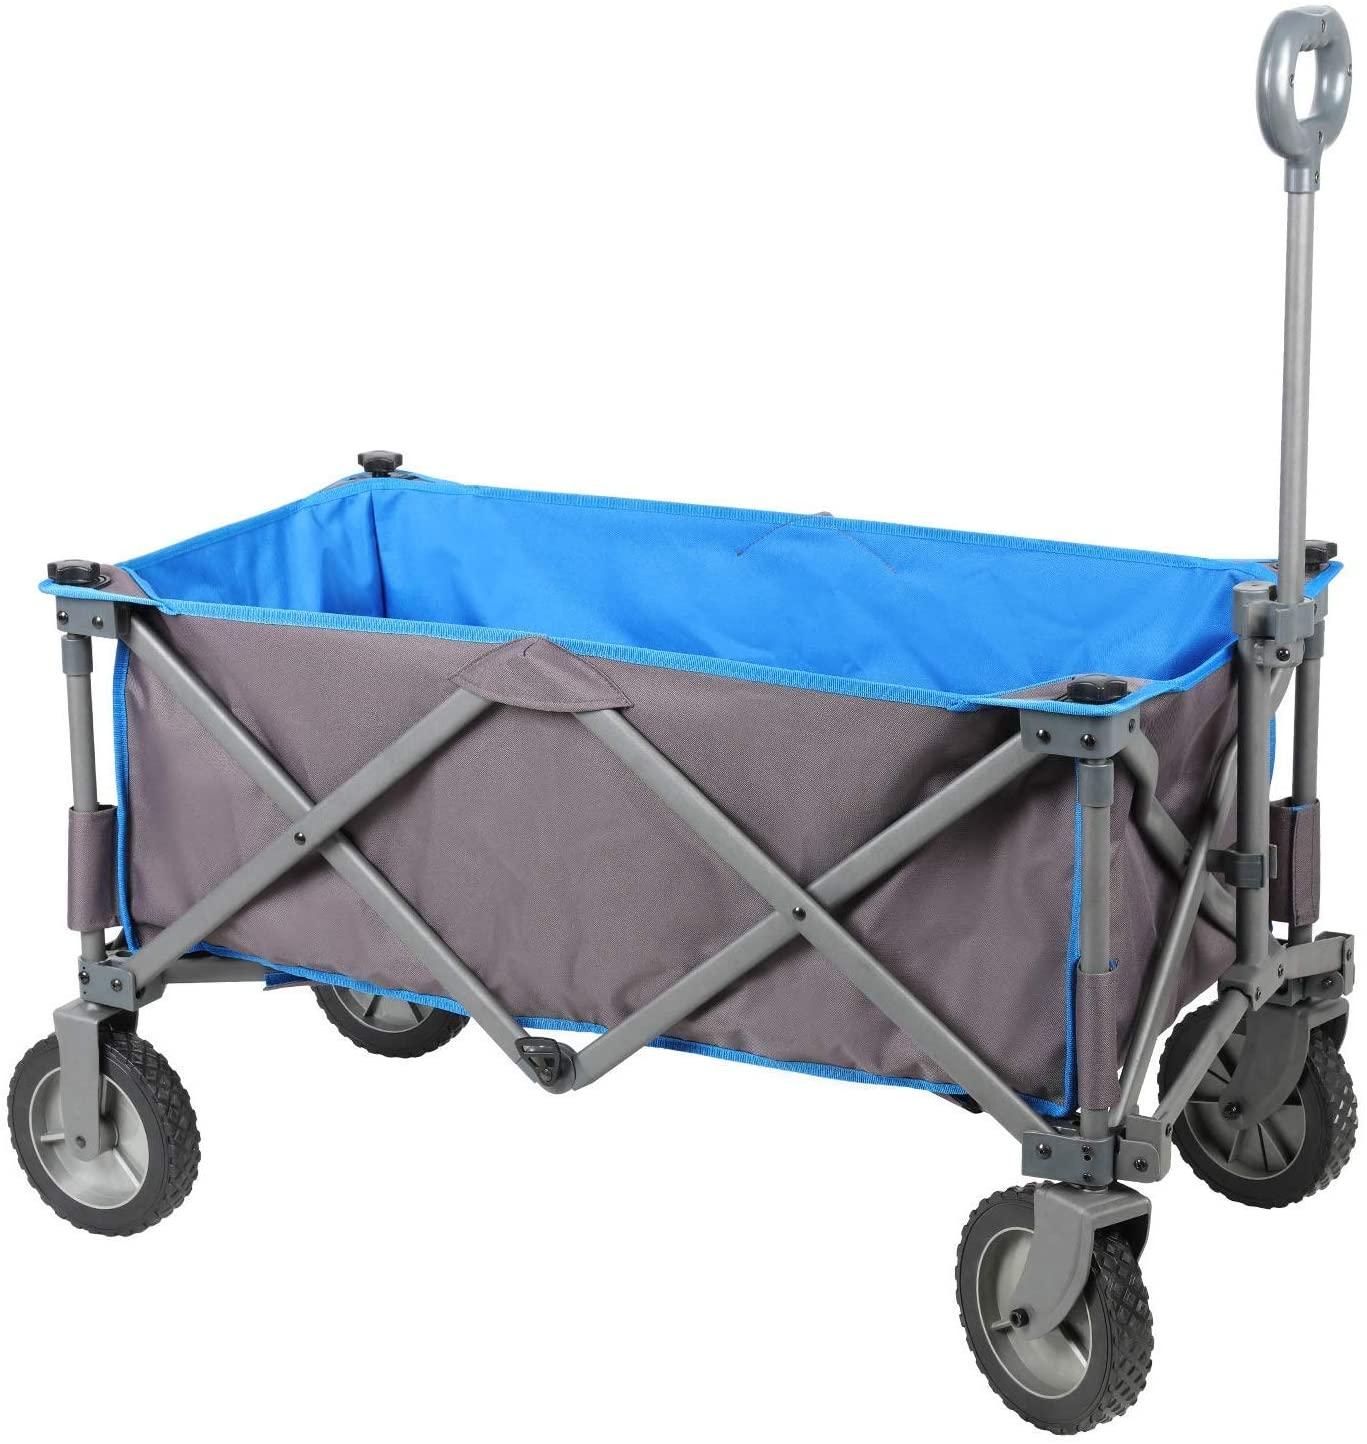 PORTAL Portable Wagon